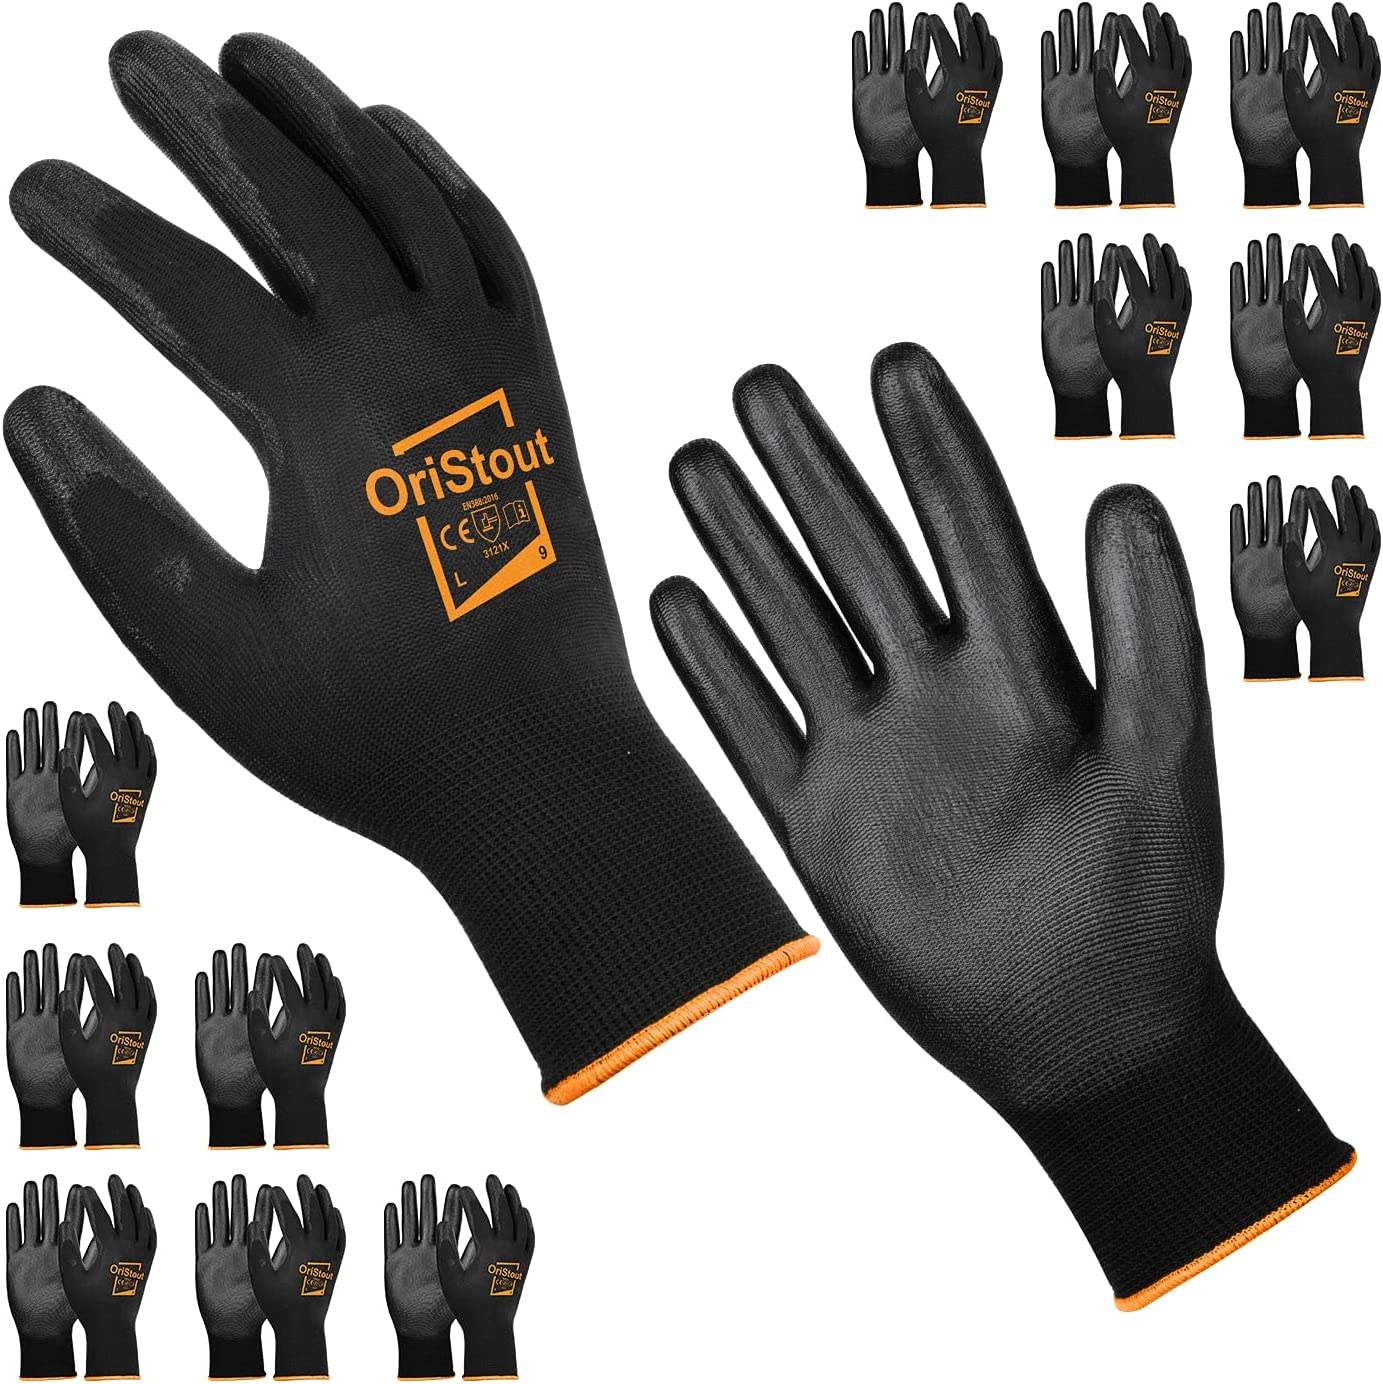 OriStout 12 Pairs Thin Work Gloves Men New life Bulk Pack Br Lightweight Detroit Mall